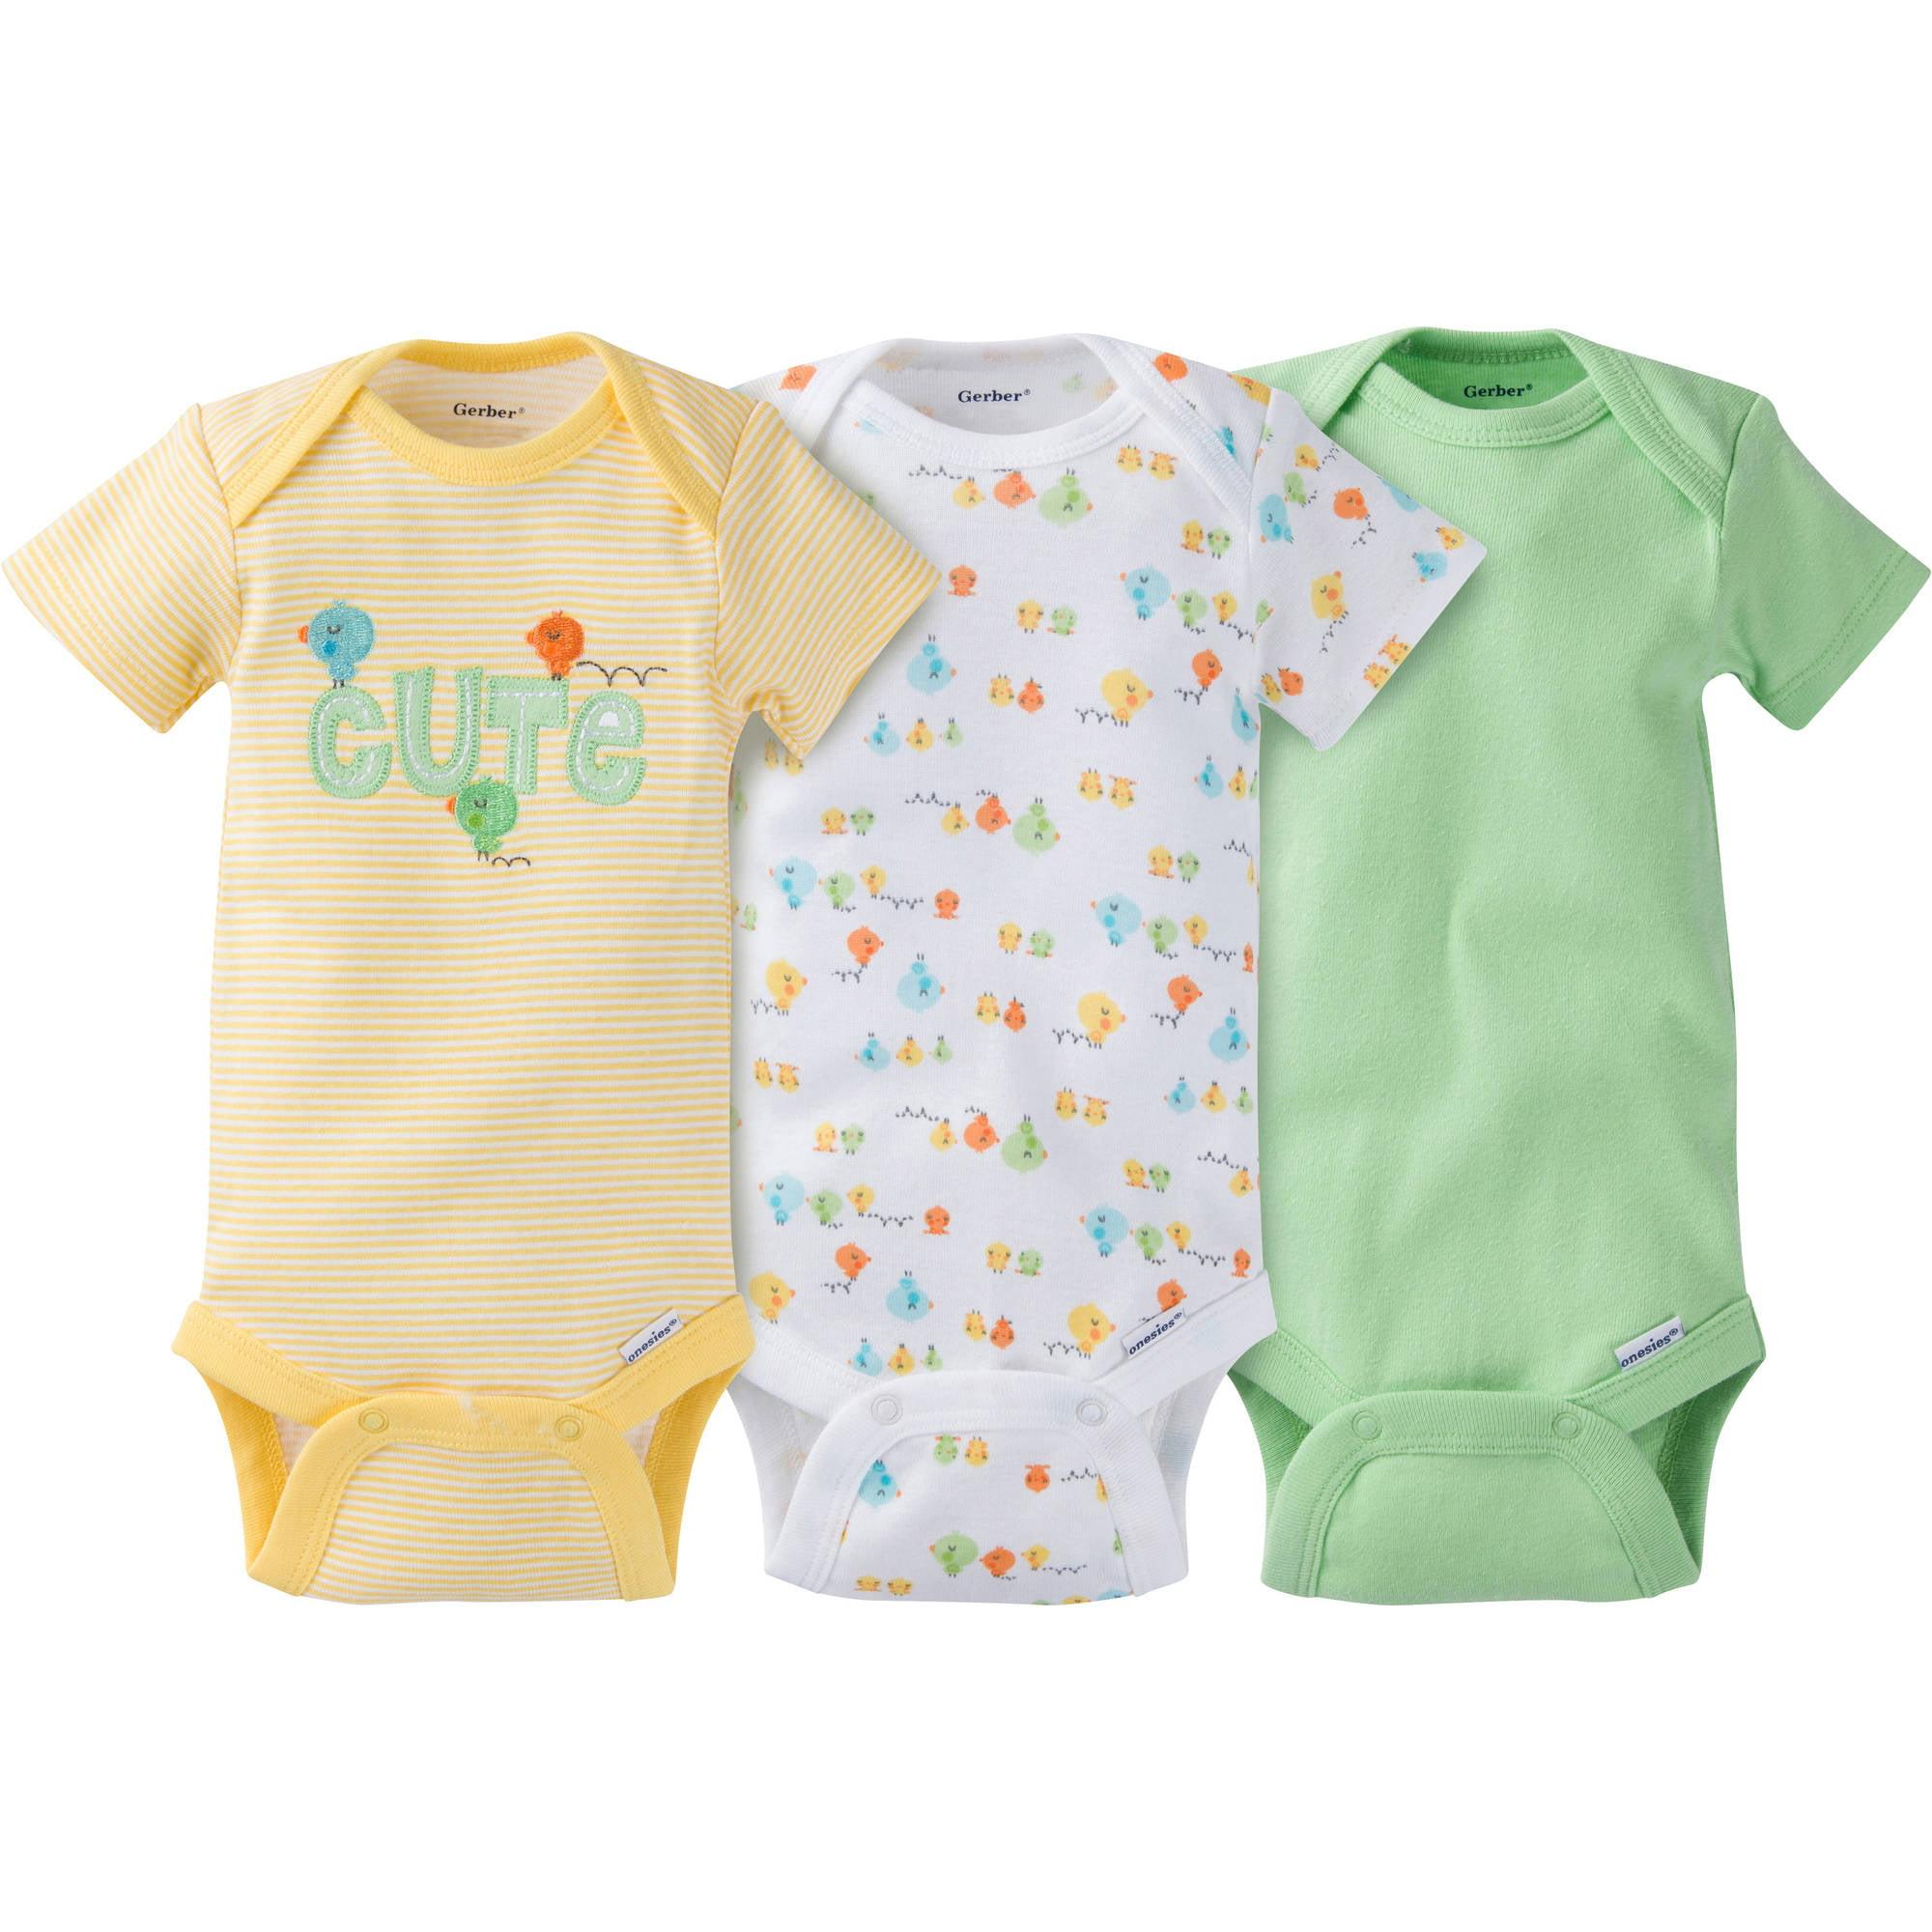 Gerber Newborn Baby Boy or Girl Unisex Onesies Bodysuits Assorted, 3-Pack